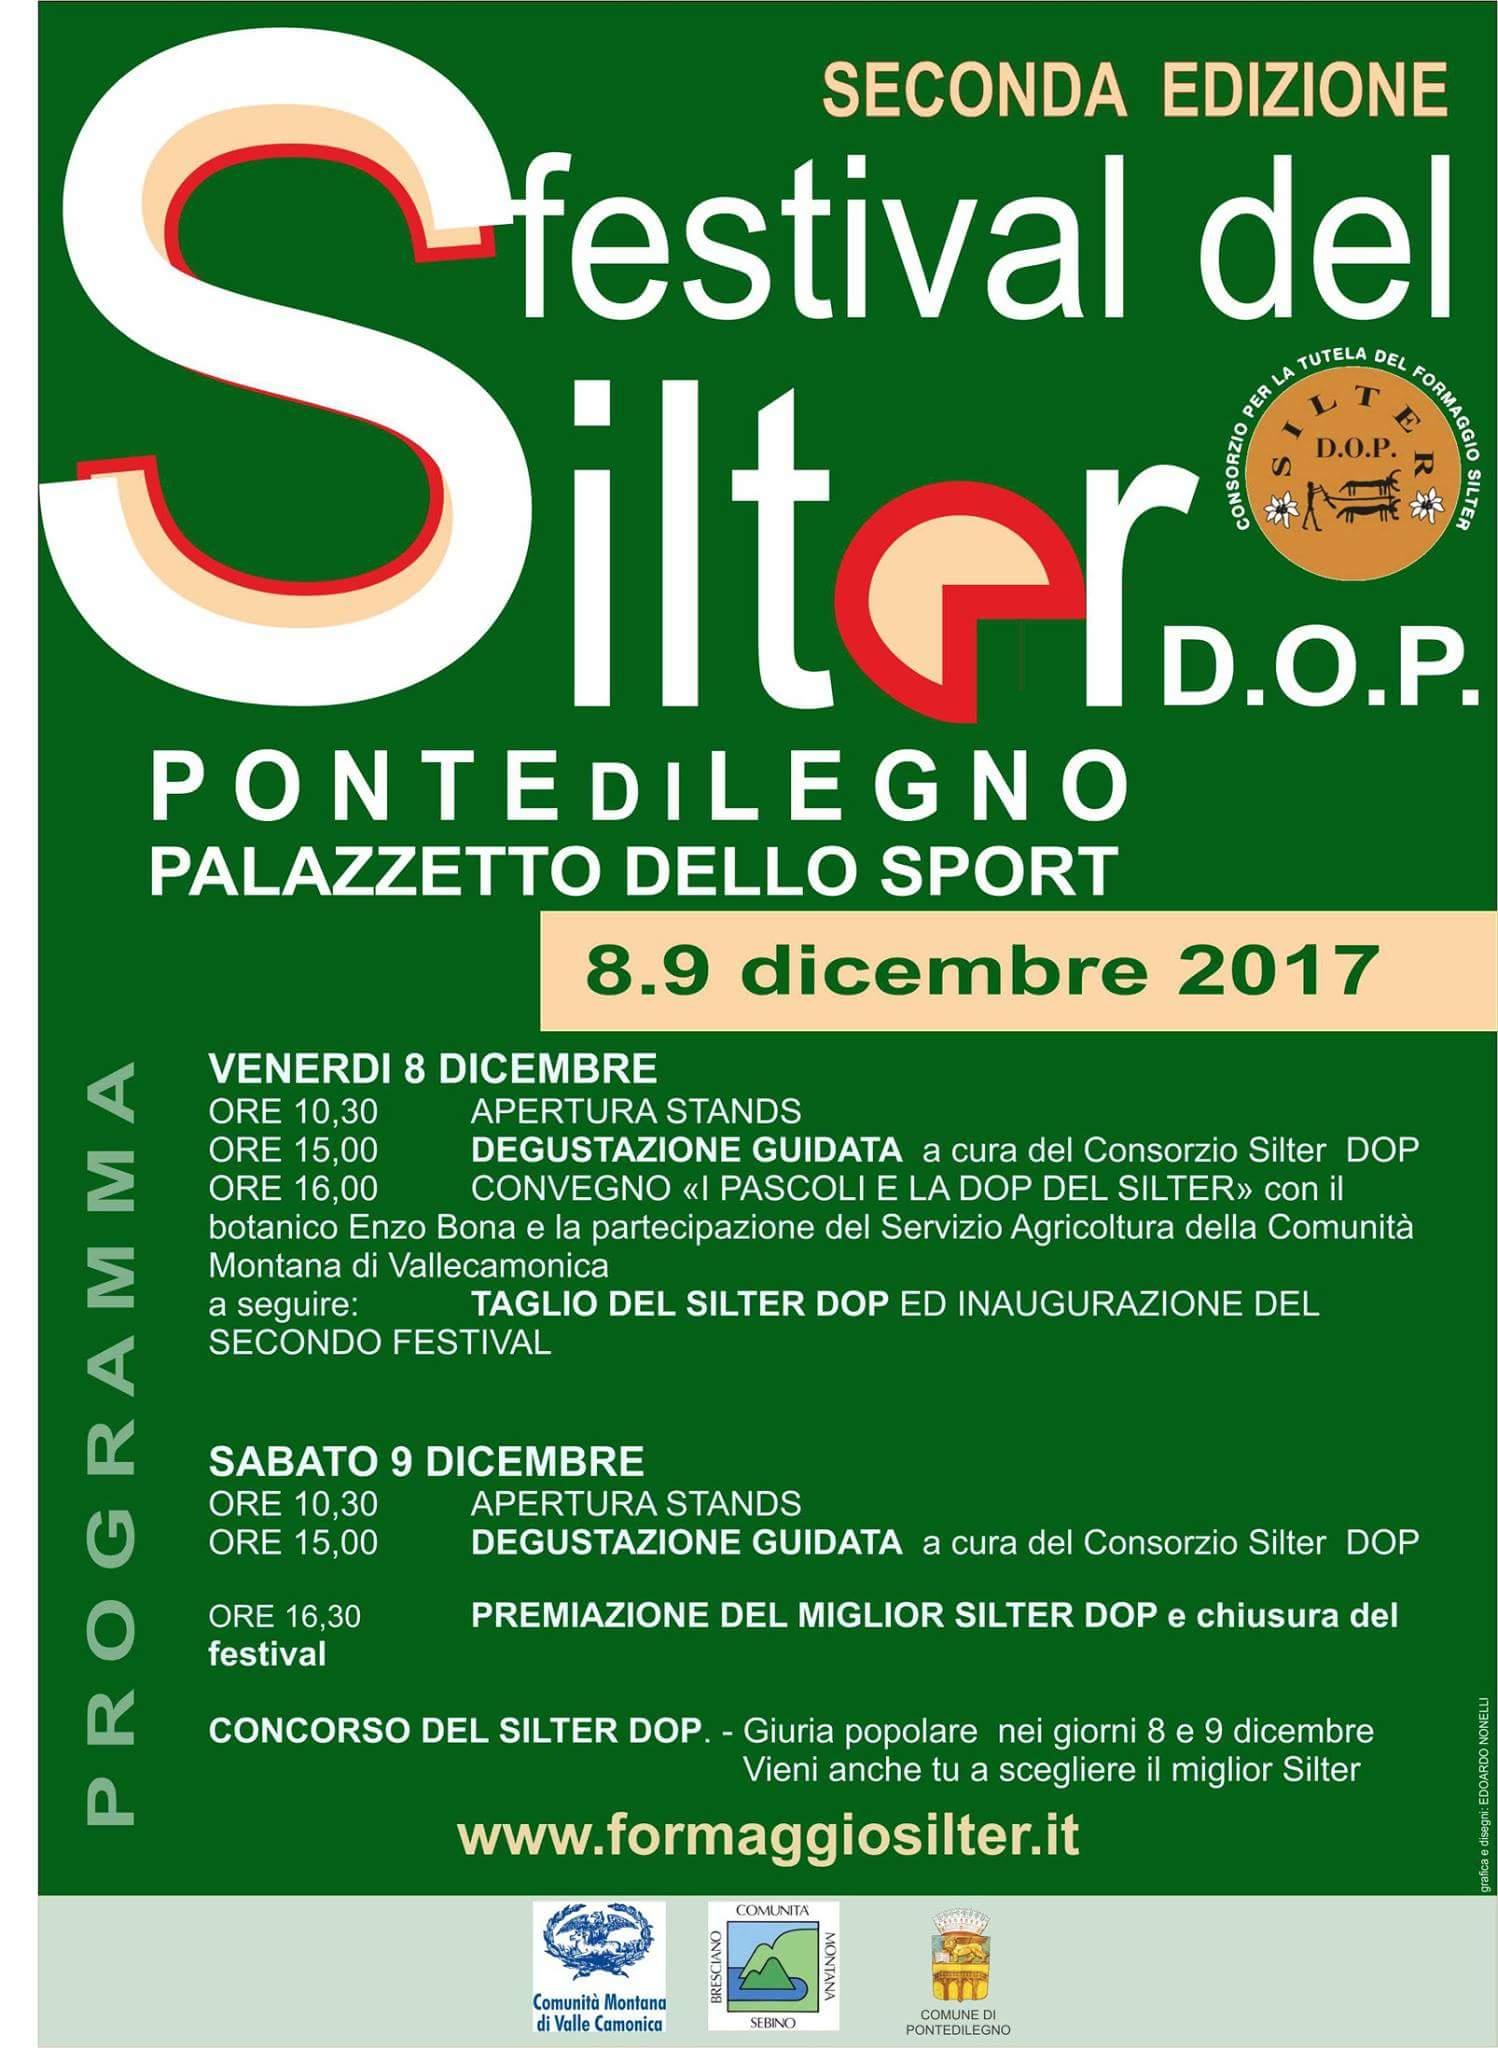 Festival Silter Dop 2017